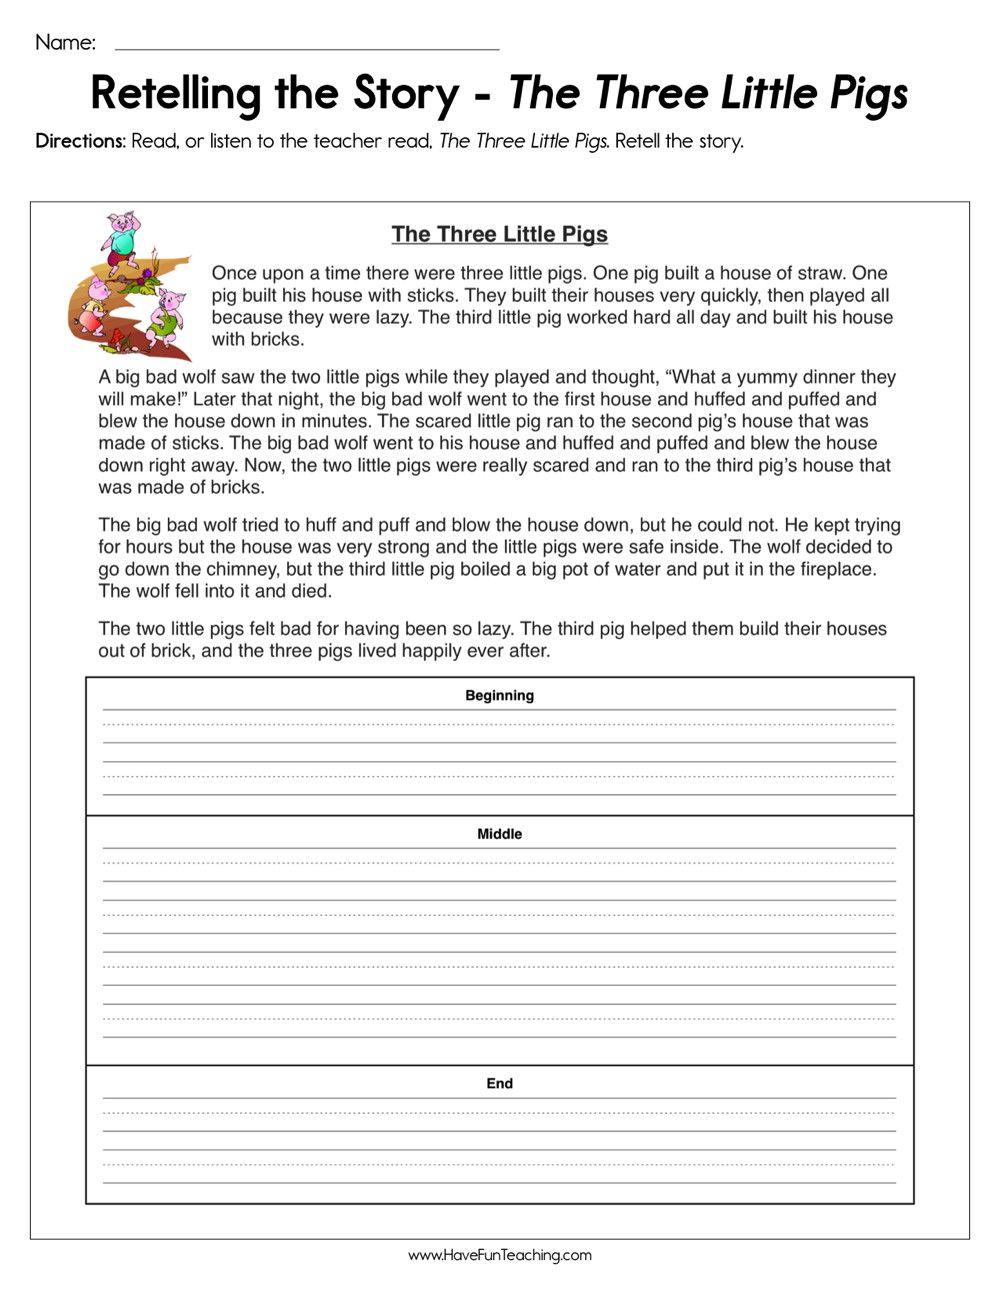 Retell Worksheet First Grade Retelling The Story The Three Little Pigs Worksheet In 2020 Story Sequencing Worksheets Sequencing Worksheets Summarizing Worksheet [ 1294 x 1000 Pixel ]